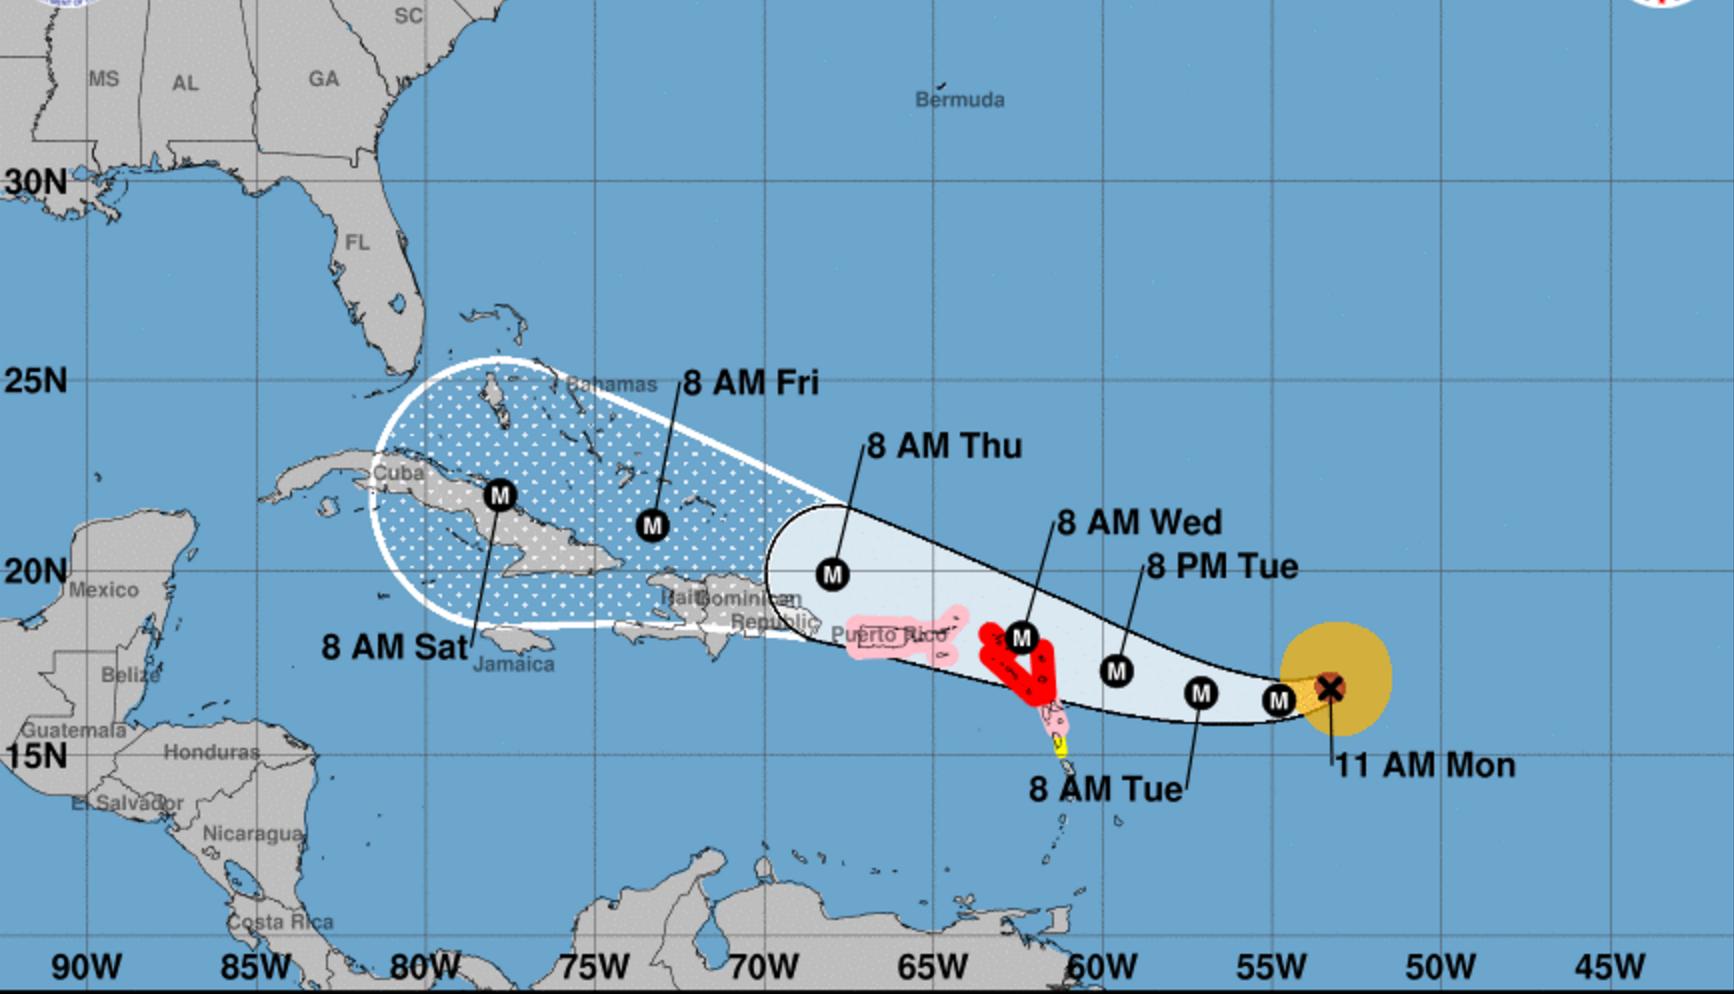 Florida Road Closures Map Google Maps Will Mark Florida Road Closures In Real Time During